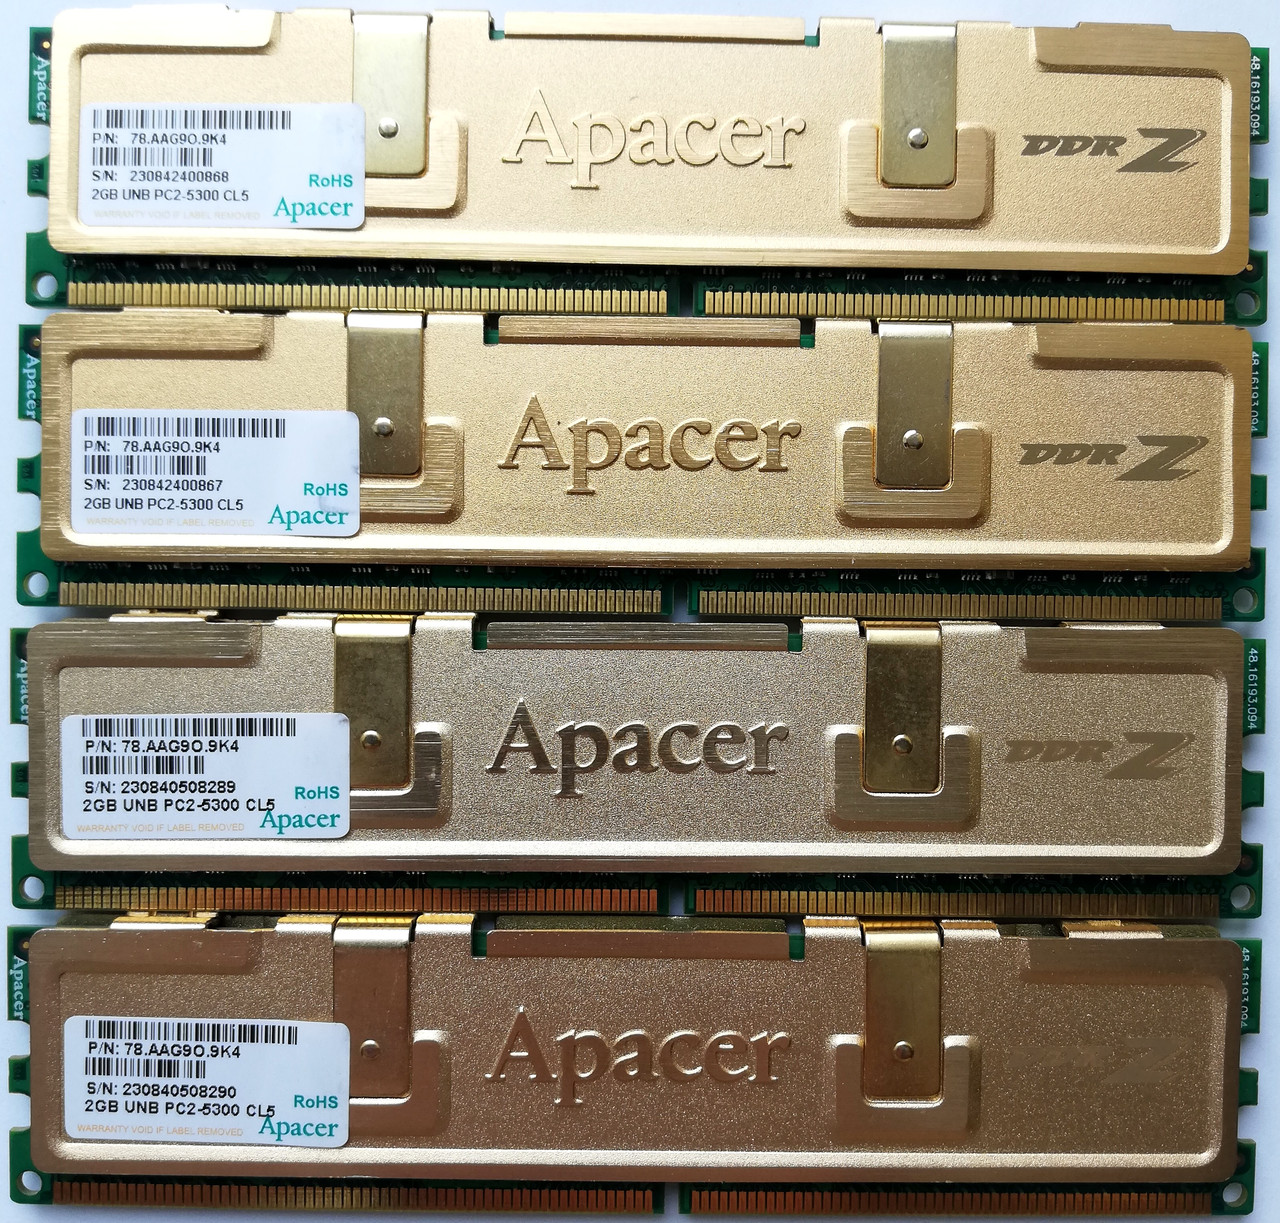 Комплект игровой оперативной памяти Apacer DDR2 8Gb (4*2Gb) 667MHz PC2 5300U 2R8 CL5 (78.AAG9O.9K4) Б/У